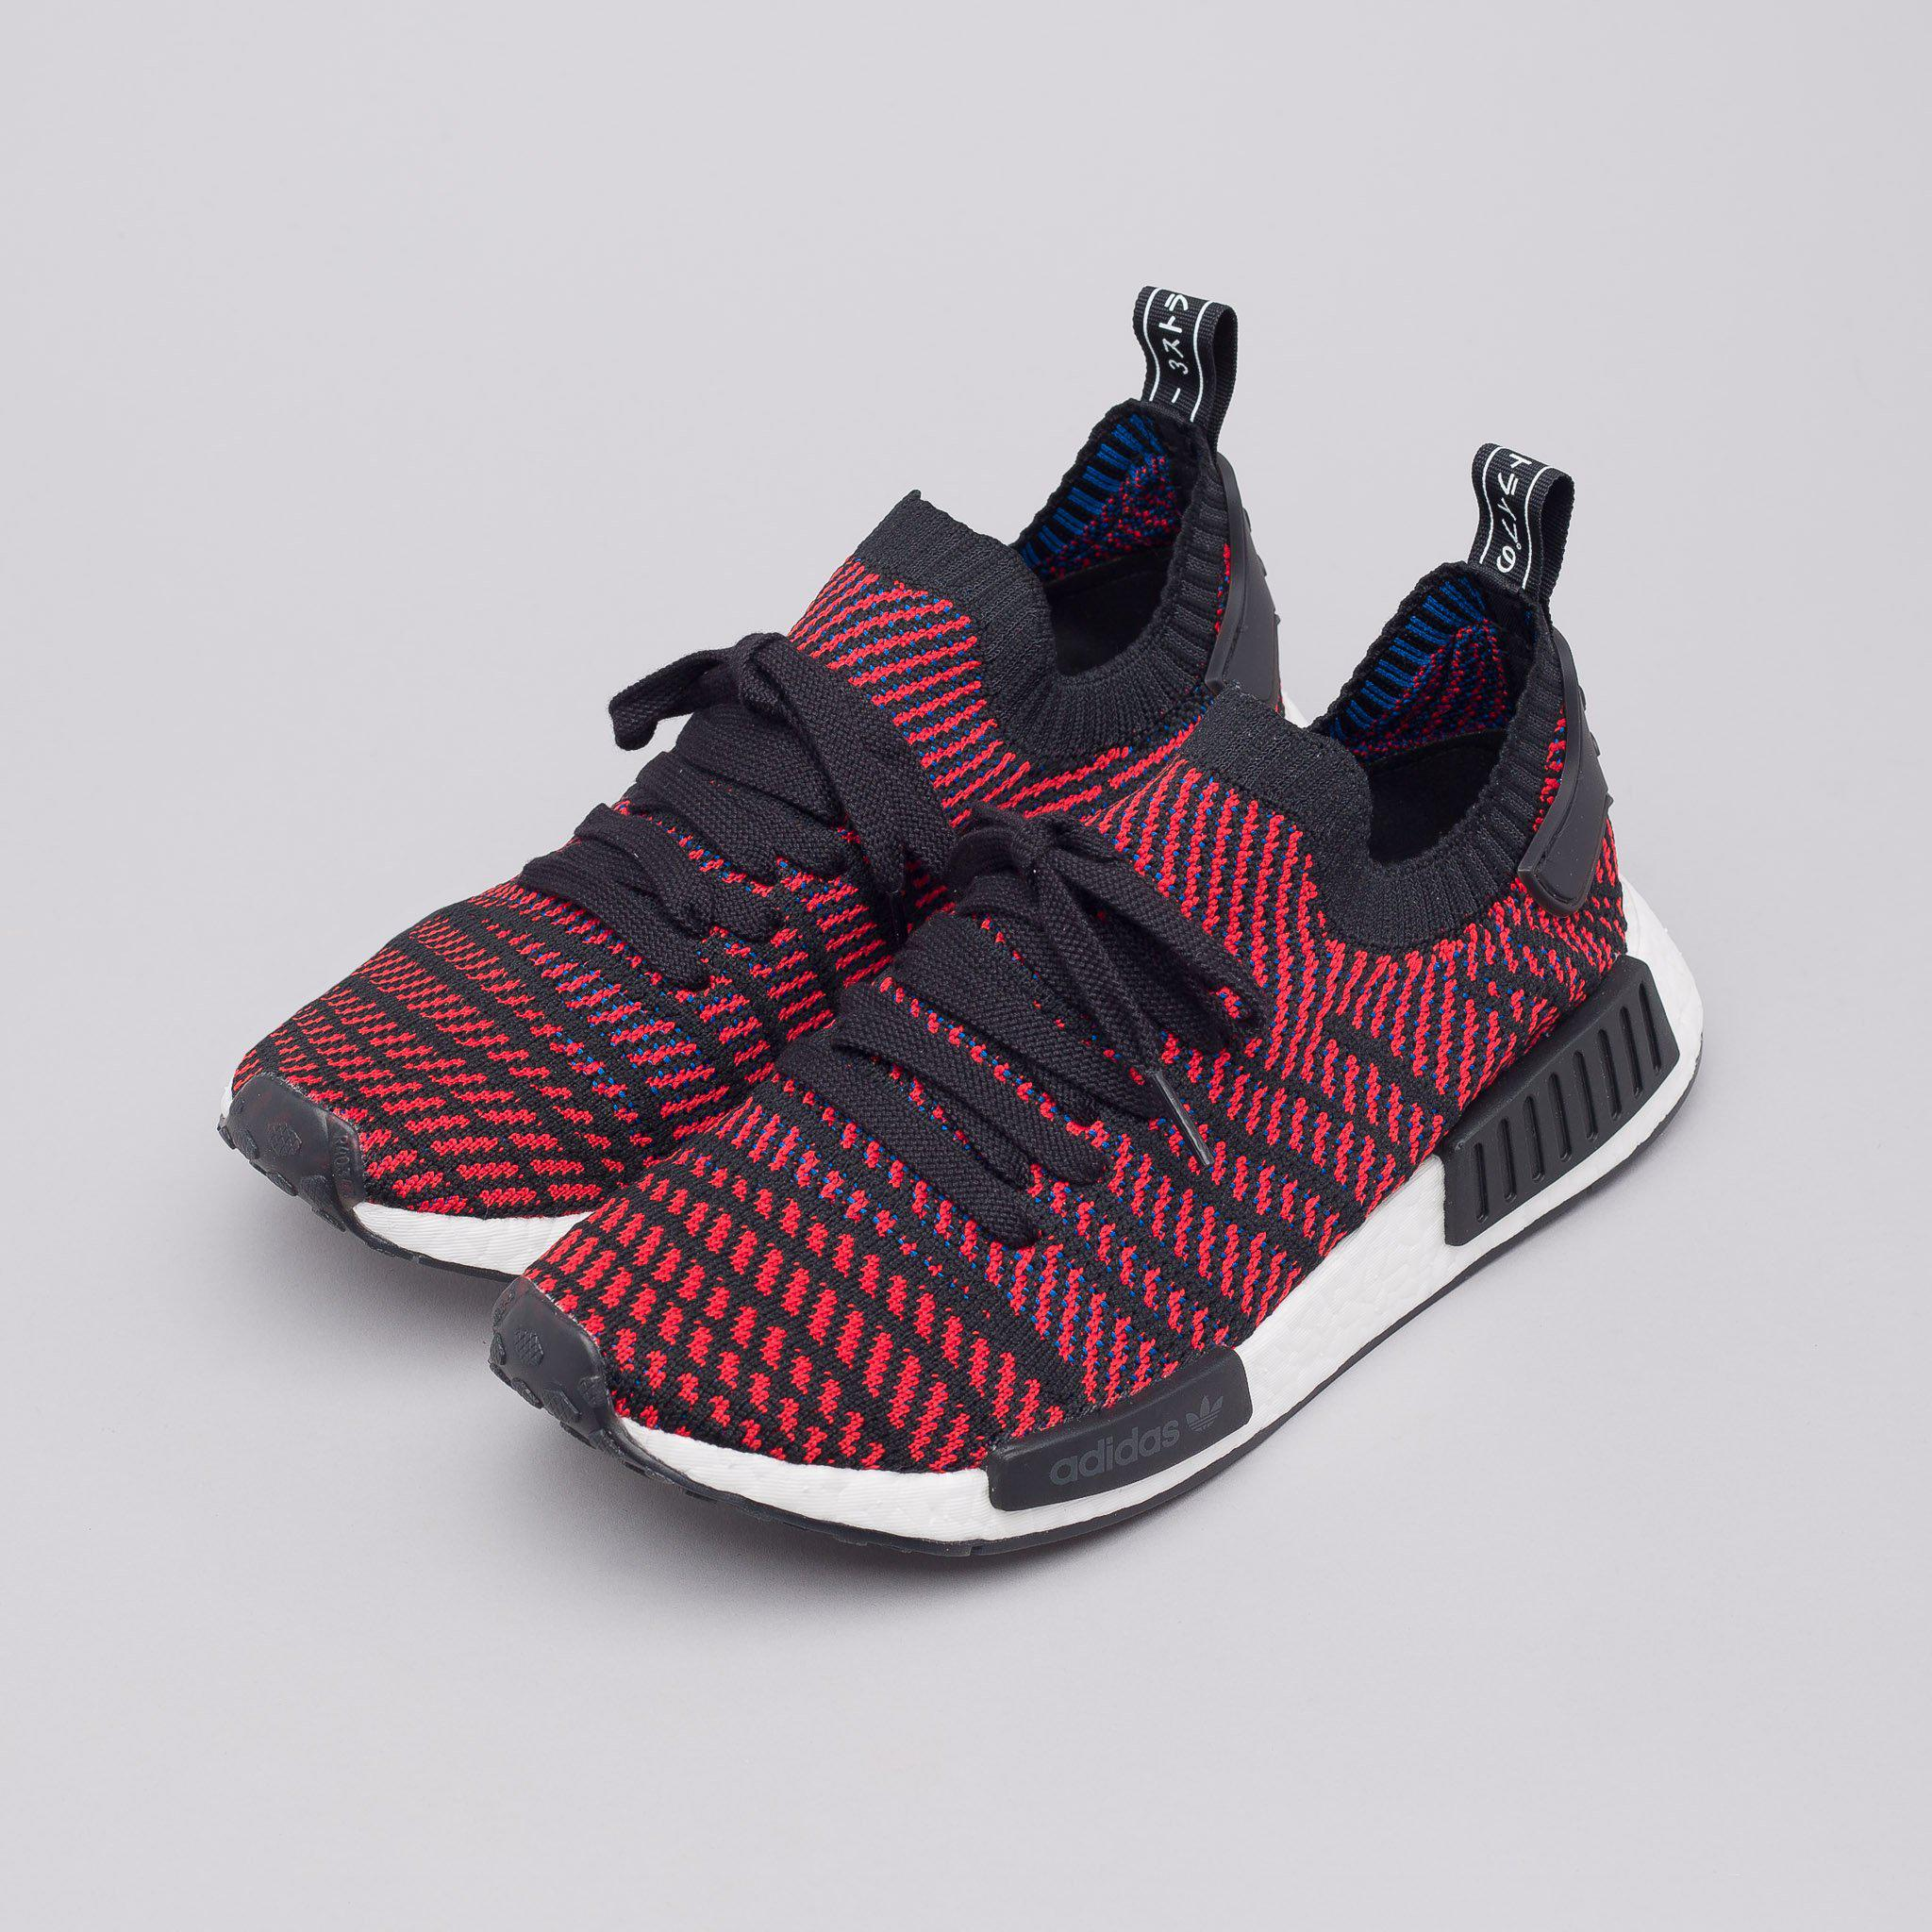 69c309072 ... denmark lyst adidas nmd r1 primeknit stlt in core black red blue in red  ec41f 7893f